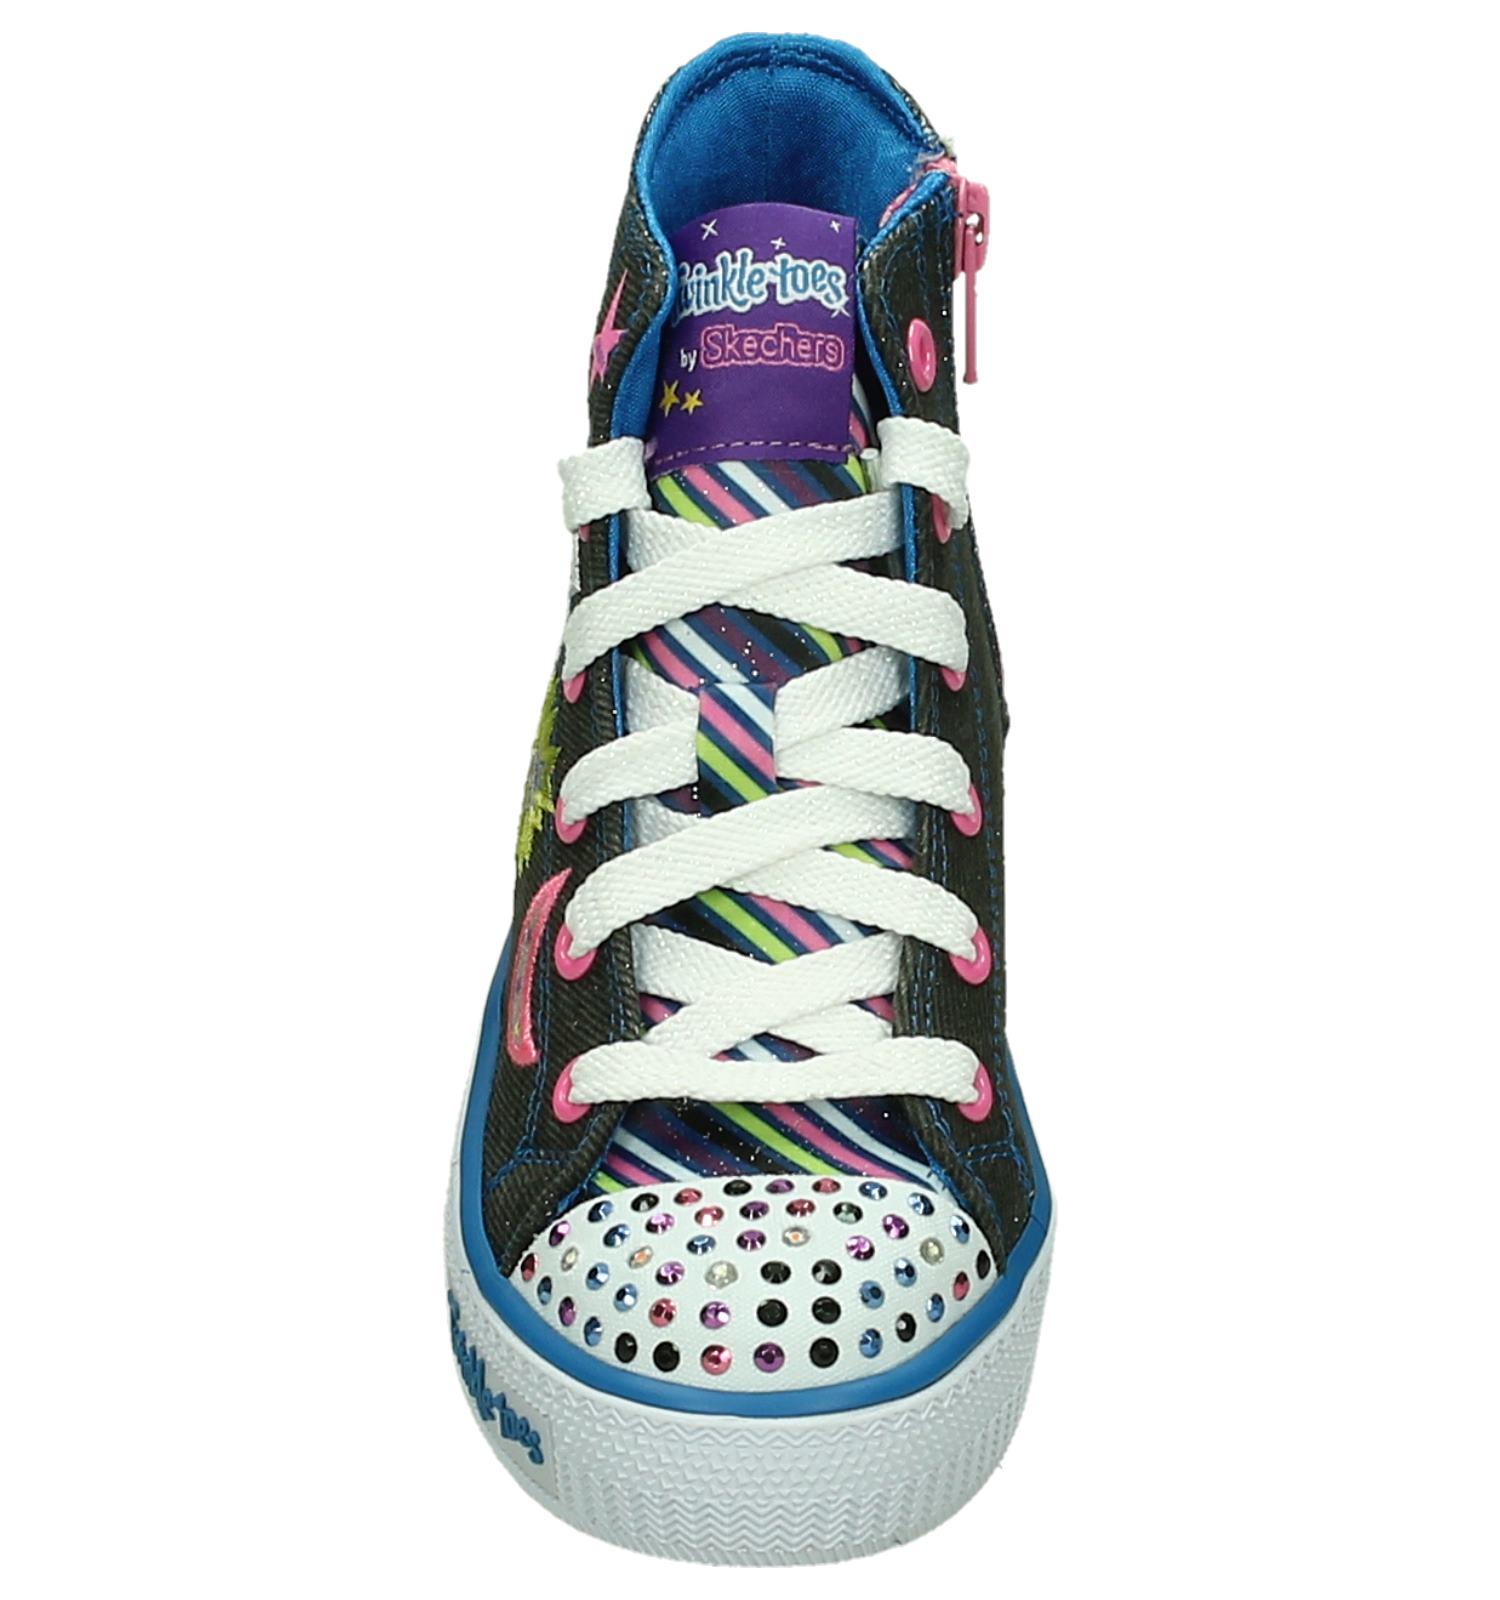 Skechers Shuffles Twist Grijze Sneakers met Lichtjes | TORFS